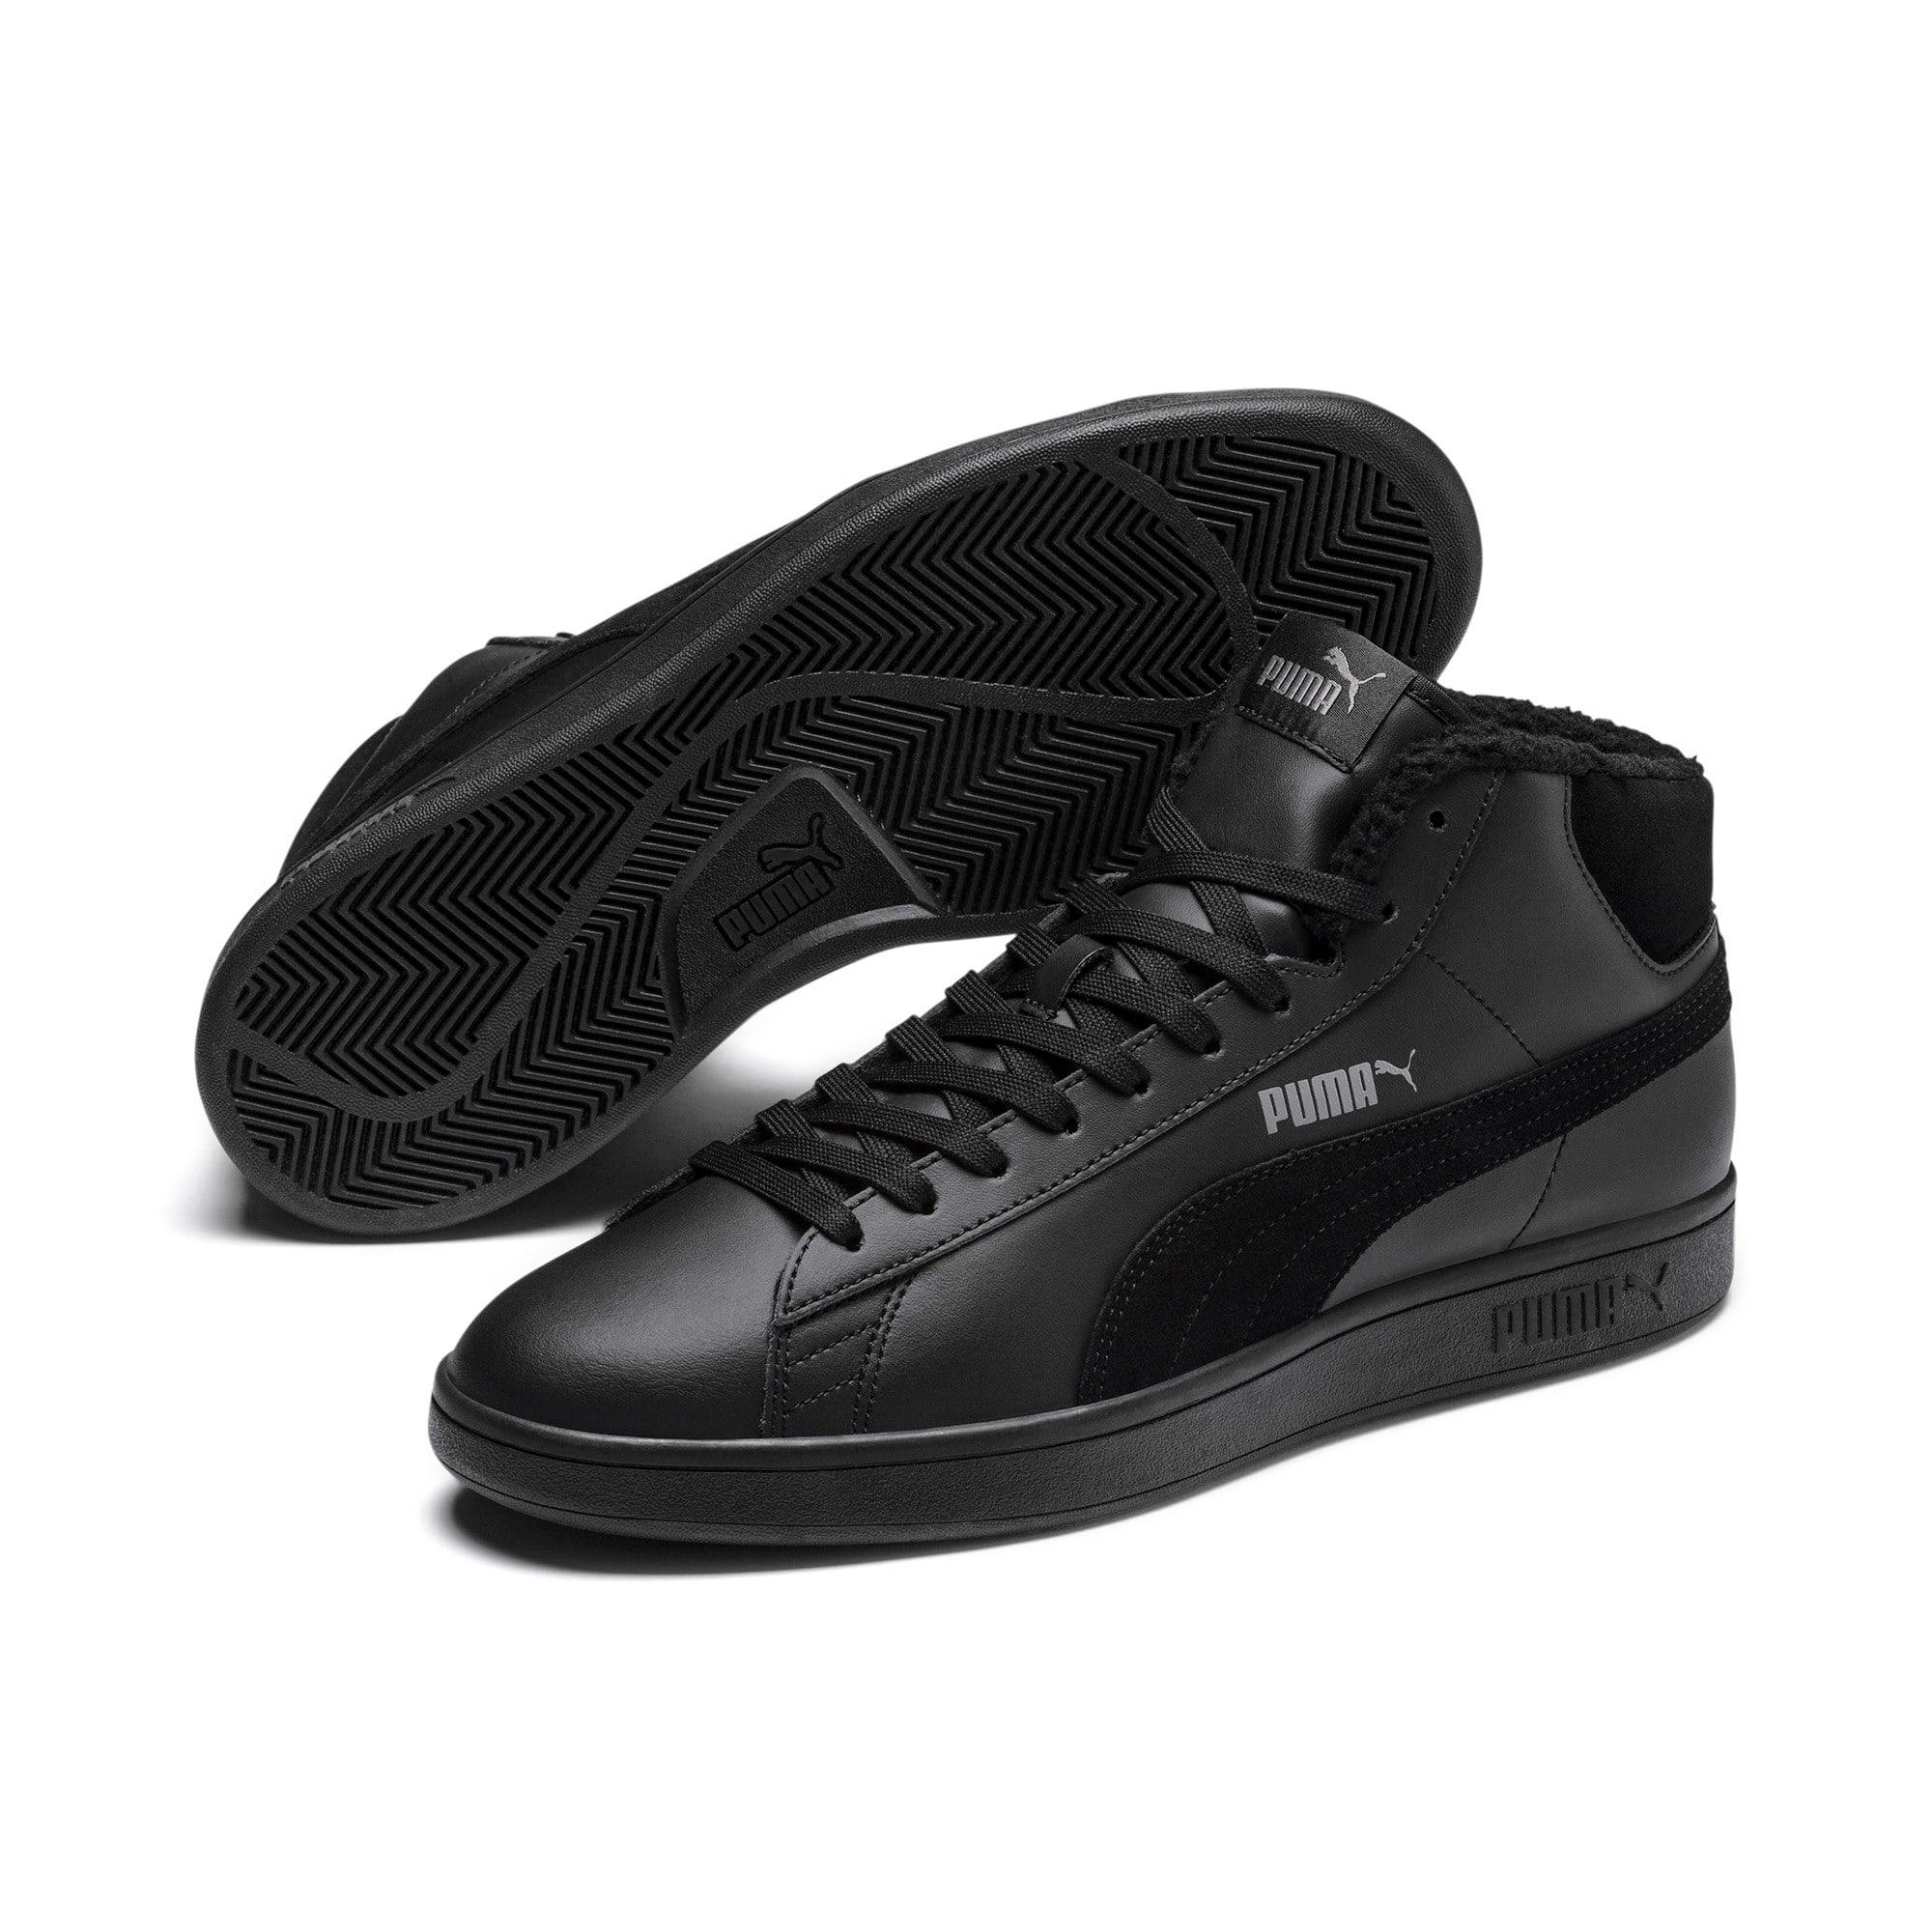 Thumbnail 3 of Smash v2 Mid Winterized Leather High Tops, Puma Black-CASTLEROCK, medium